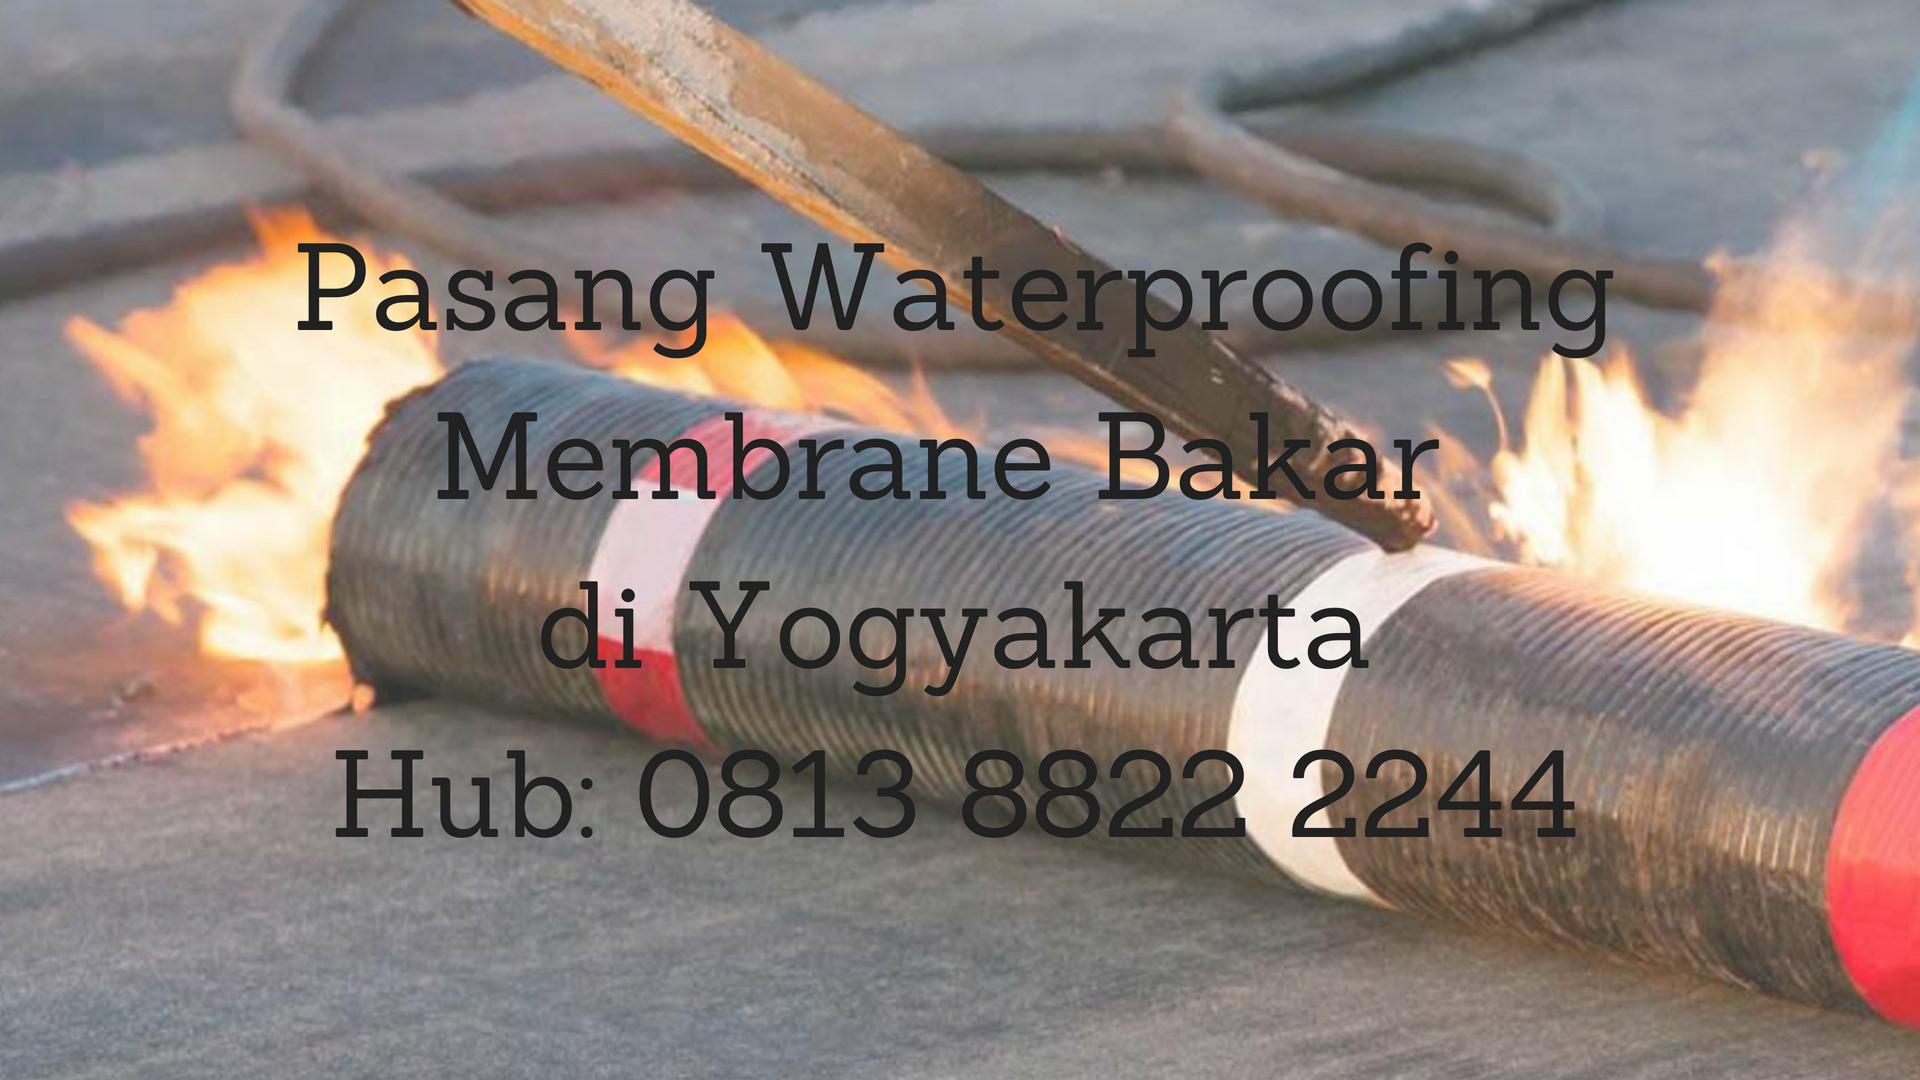 PASANG WATERPROOFING MEMBRANE BAKAR DI YOGYAKARTA.  HUB : 0813 8822 2244